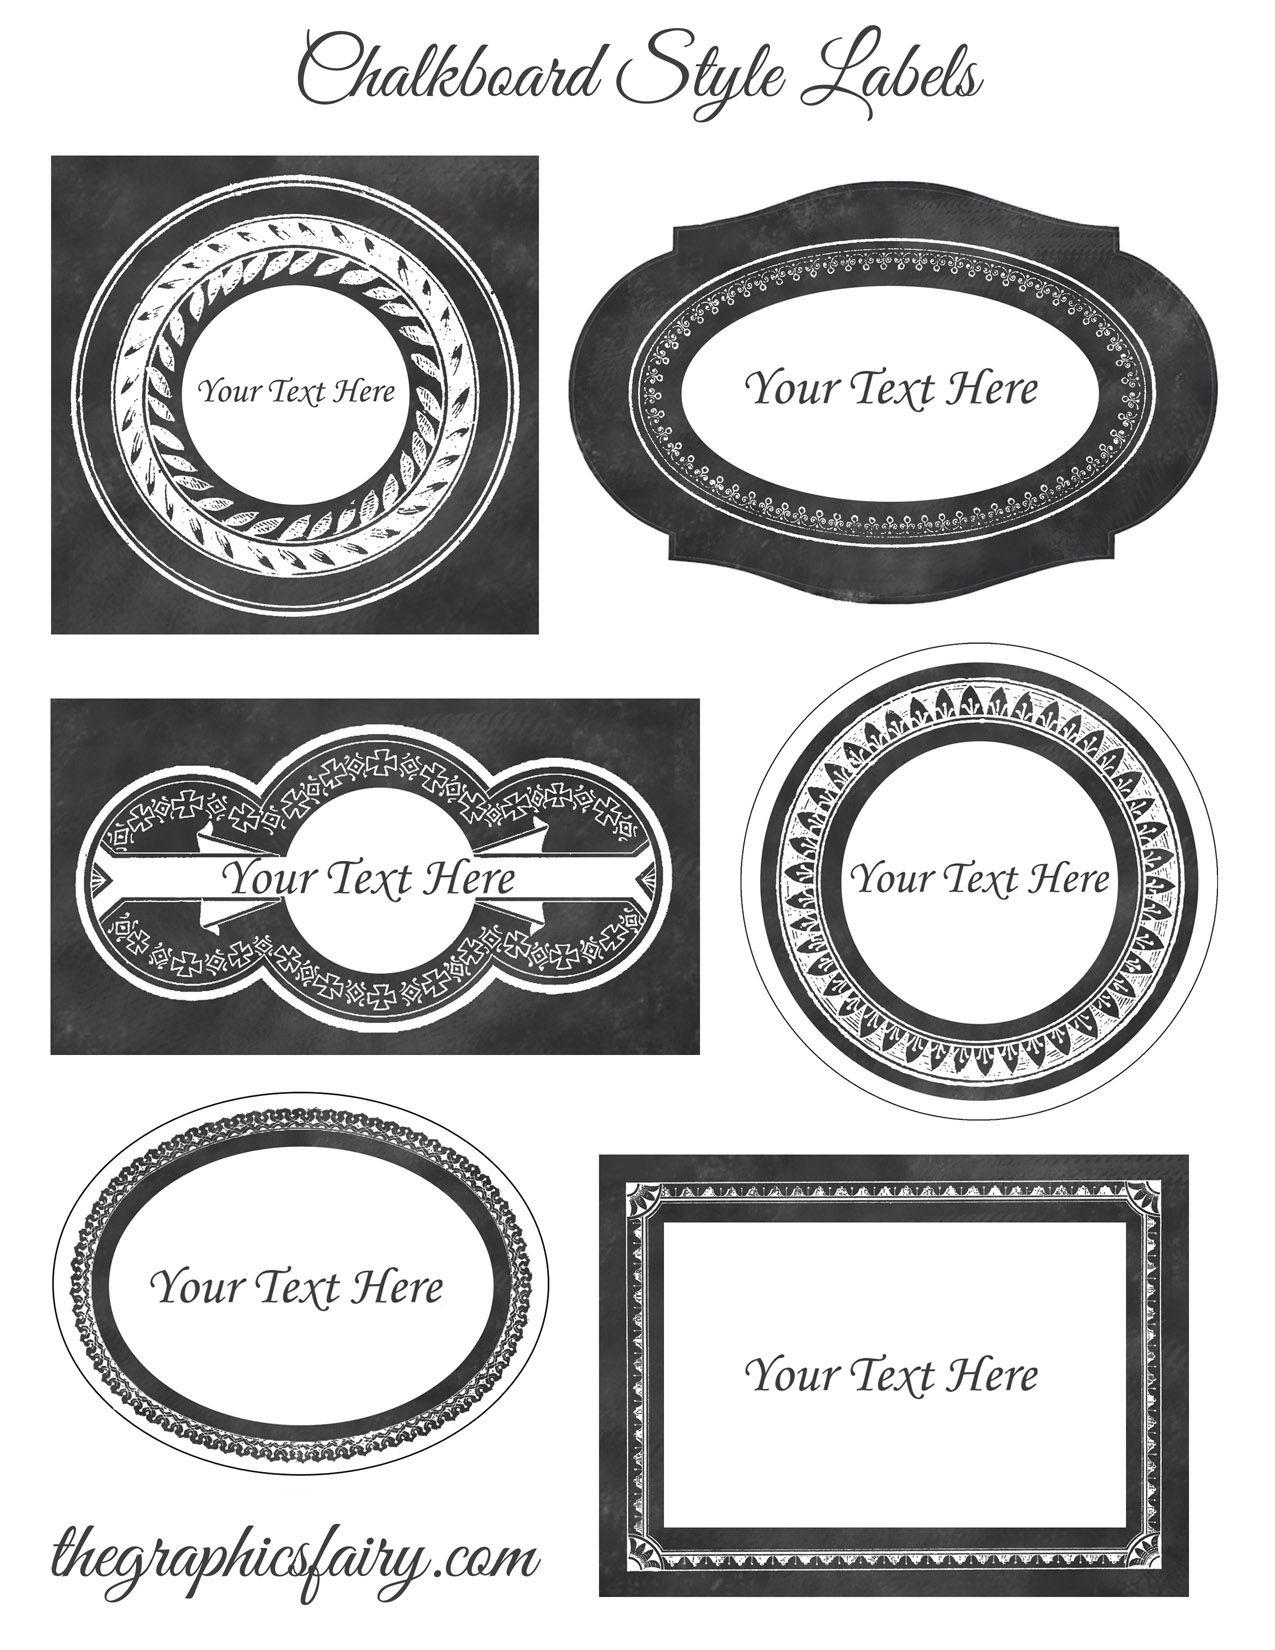 Chalkboard Style Printable Labels - Editable | Vintage Ad, Art And - Free Editable Printable Labels